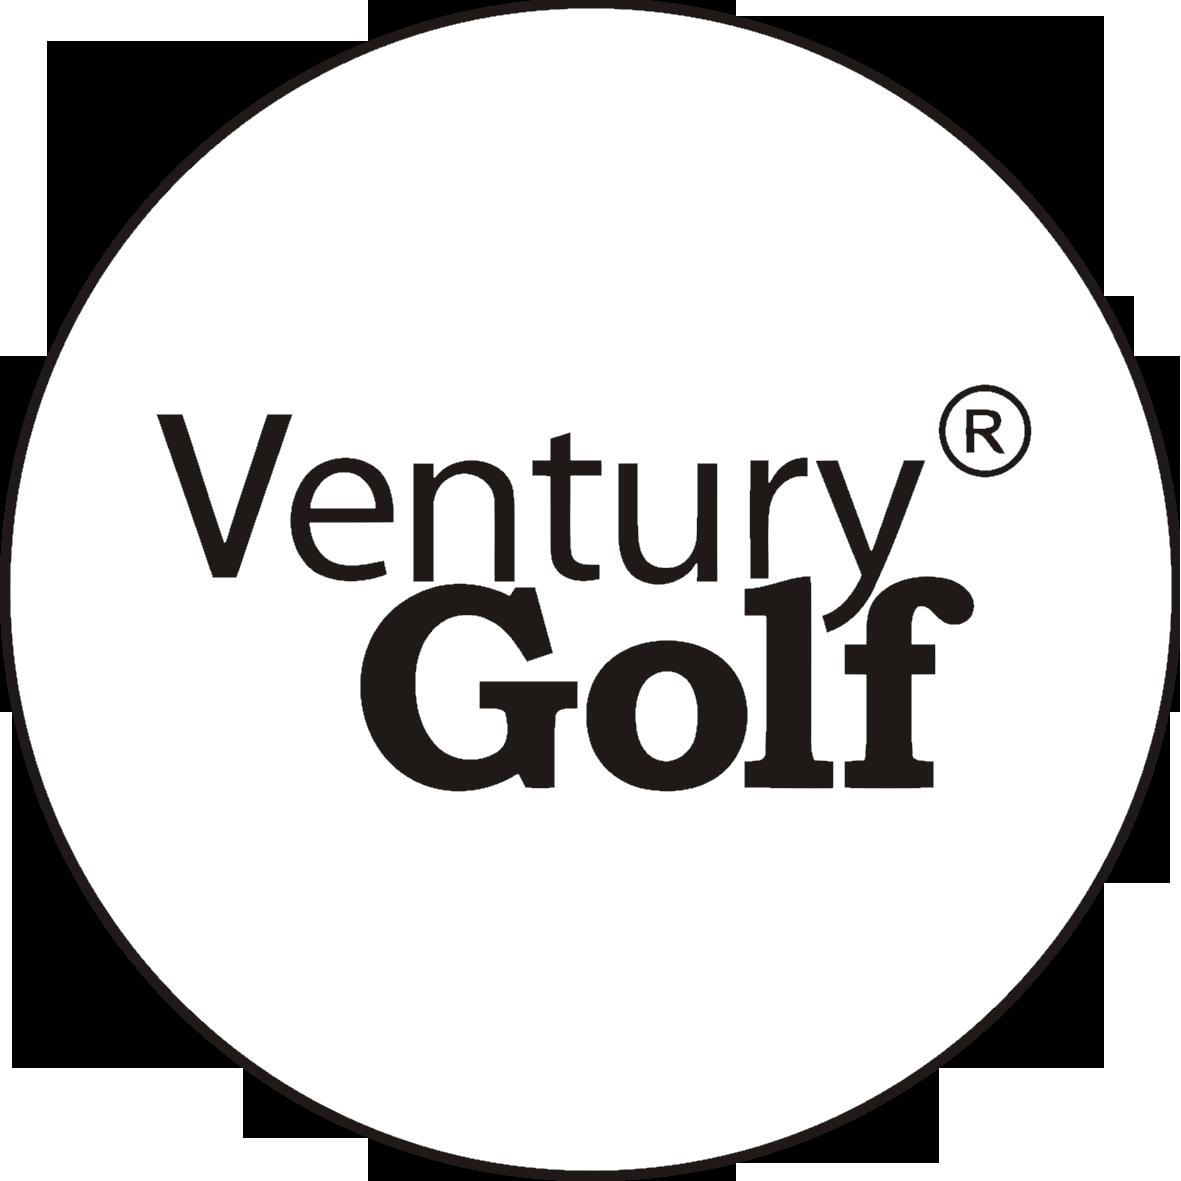 venturygolf.com